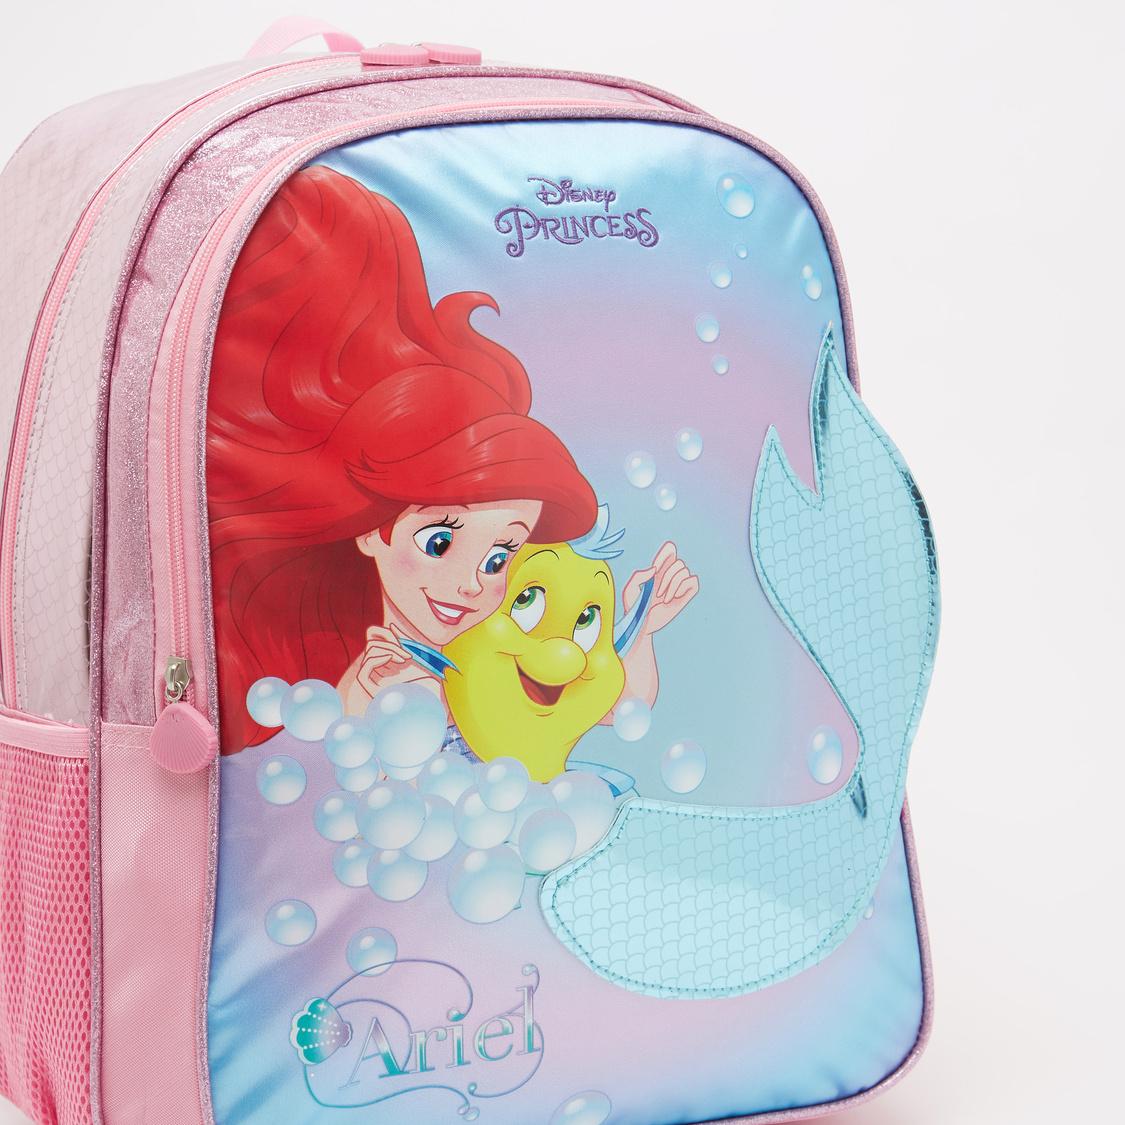 Princess Print Backpack with Adjustable Shoulder Straps - 16 Inches